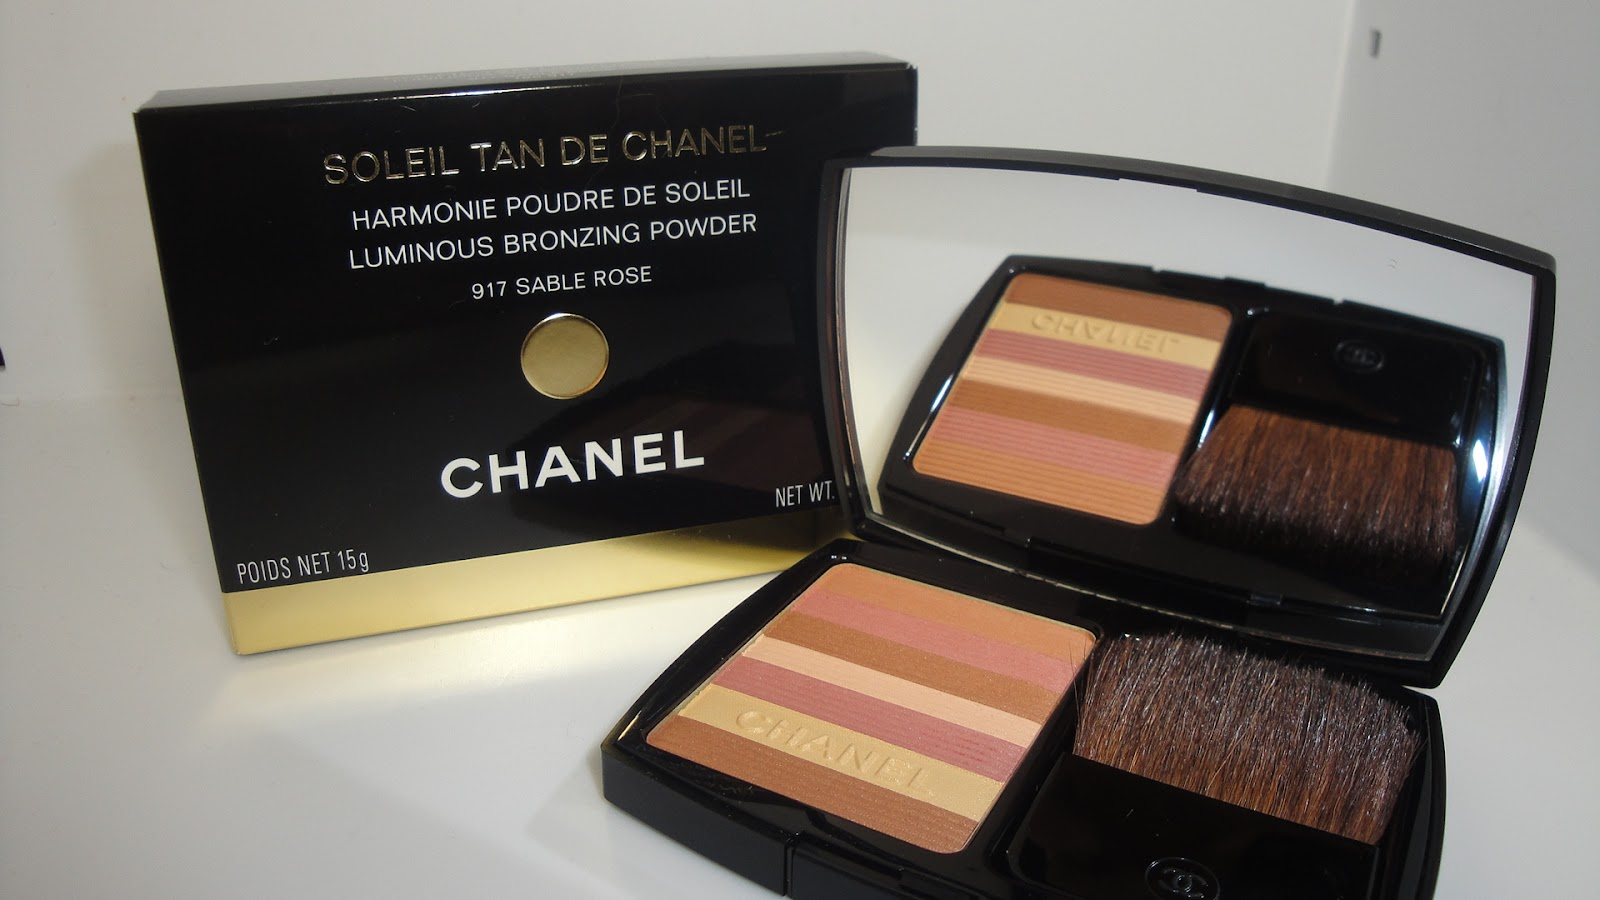 75413ee4 Jayded Dreaming Beauty Blog : 917 SABLE ROSE CHANEL SOLEIL TAN DE ...